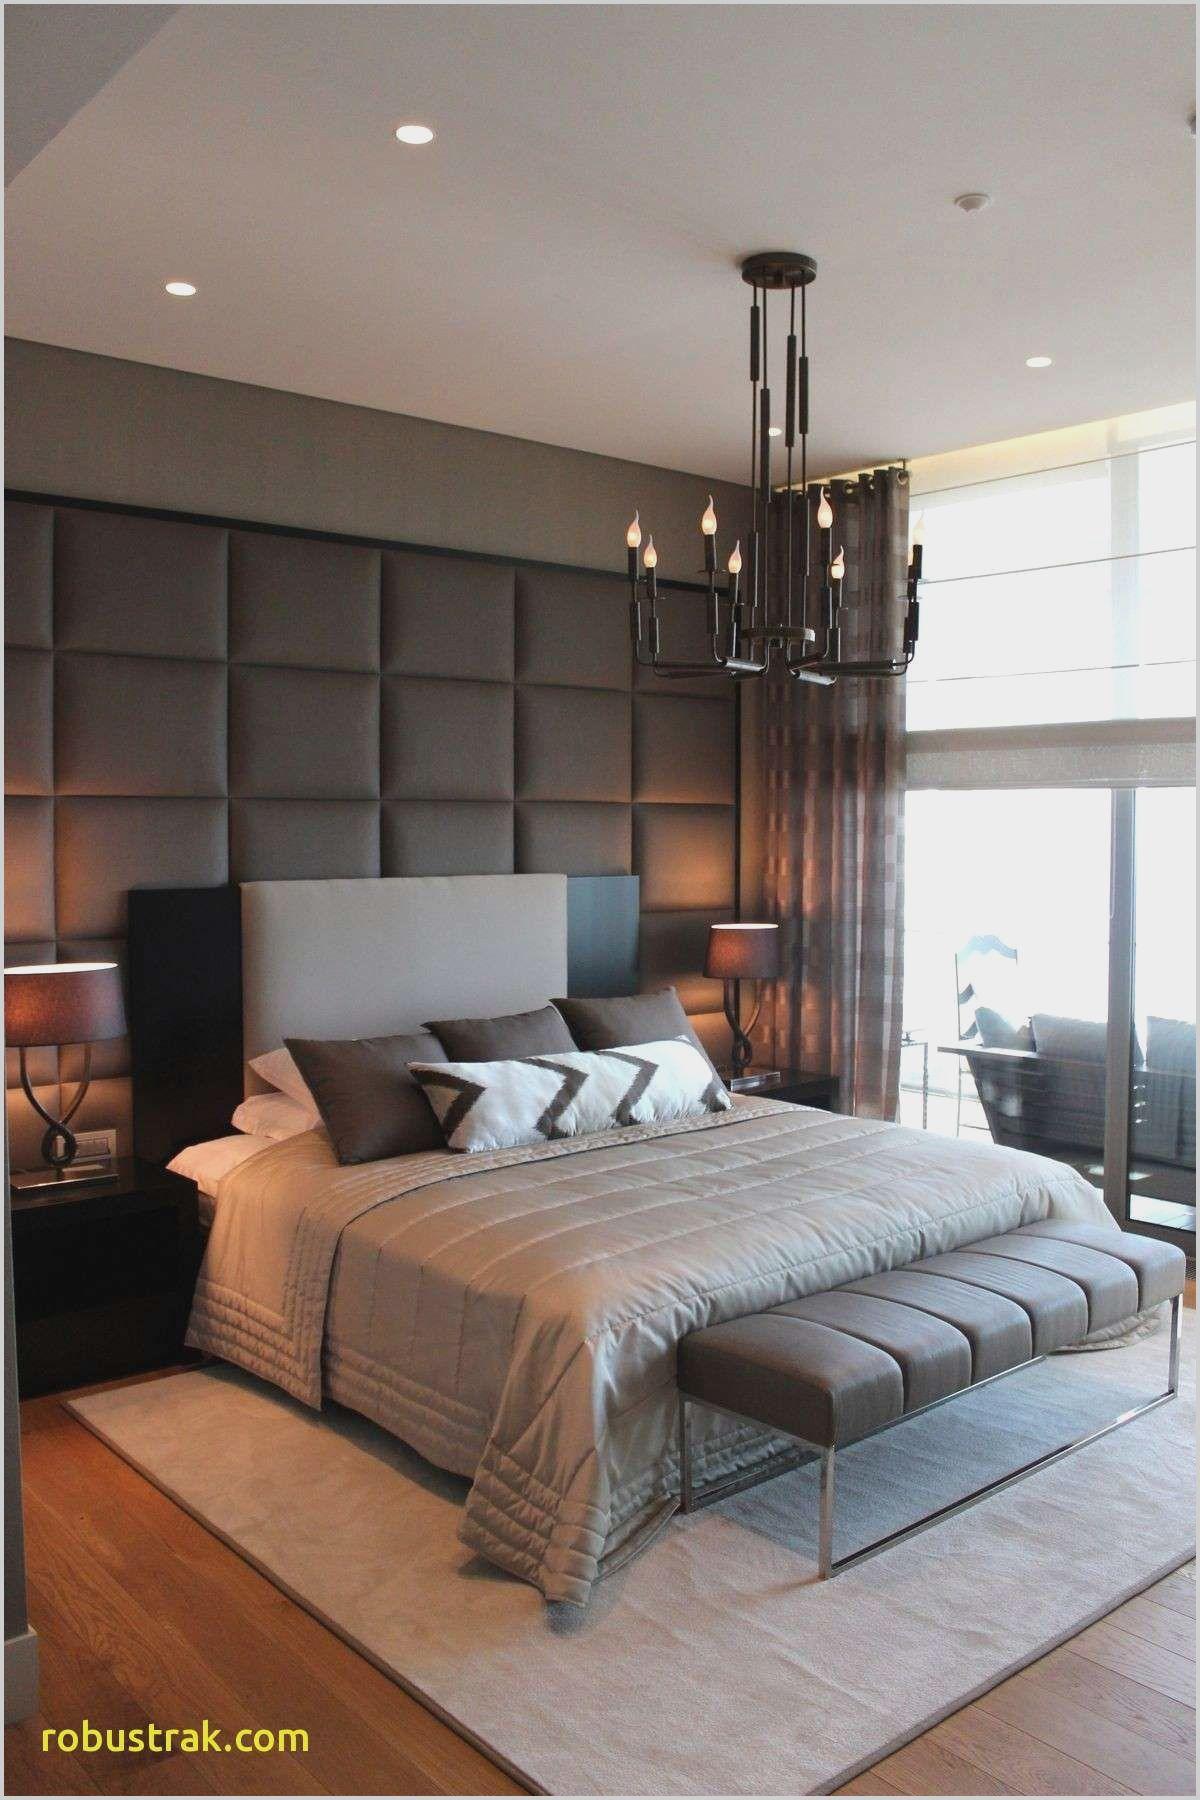 Modern Bedroom Sets Ideas In 2020 Master Bedroom Layout Modern Bedroom Design Bedroom Interior